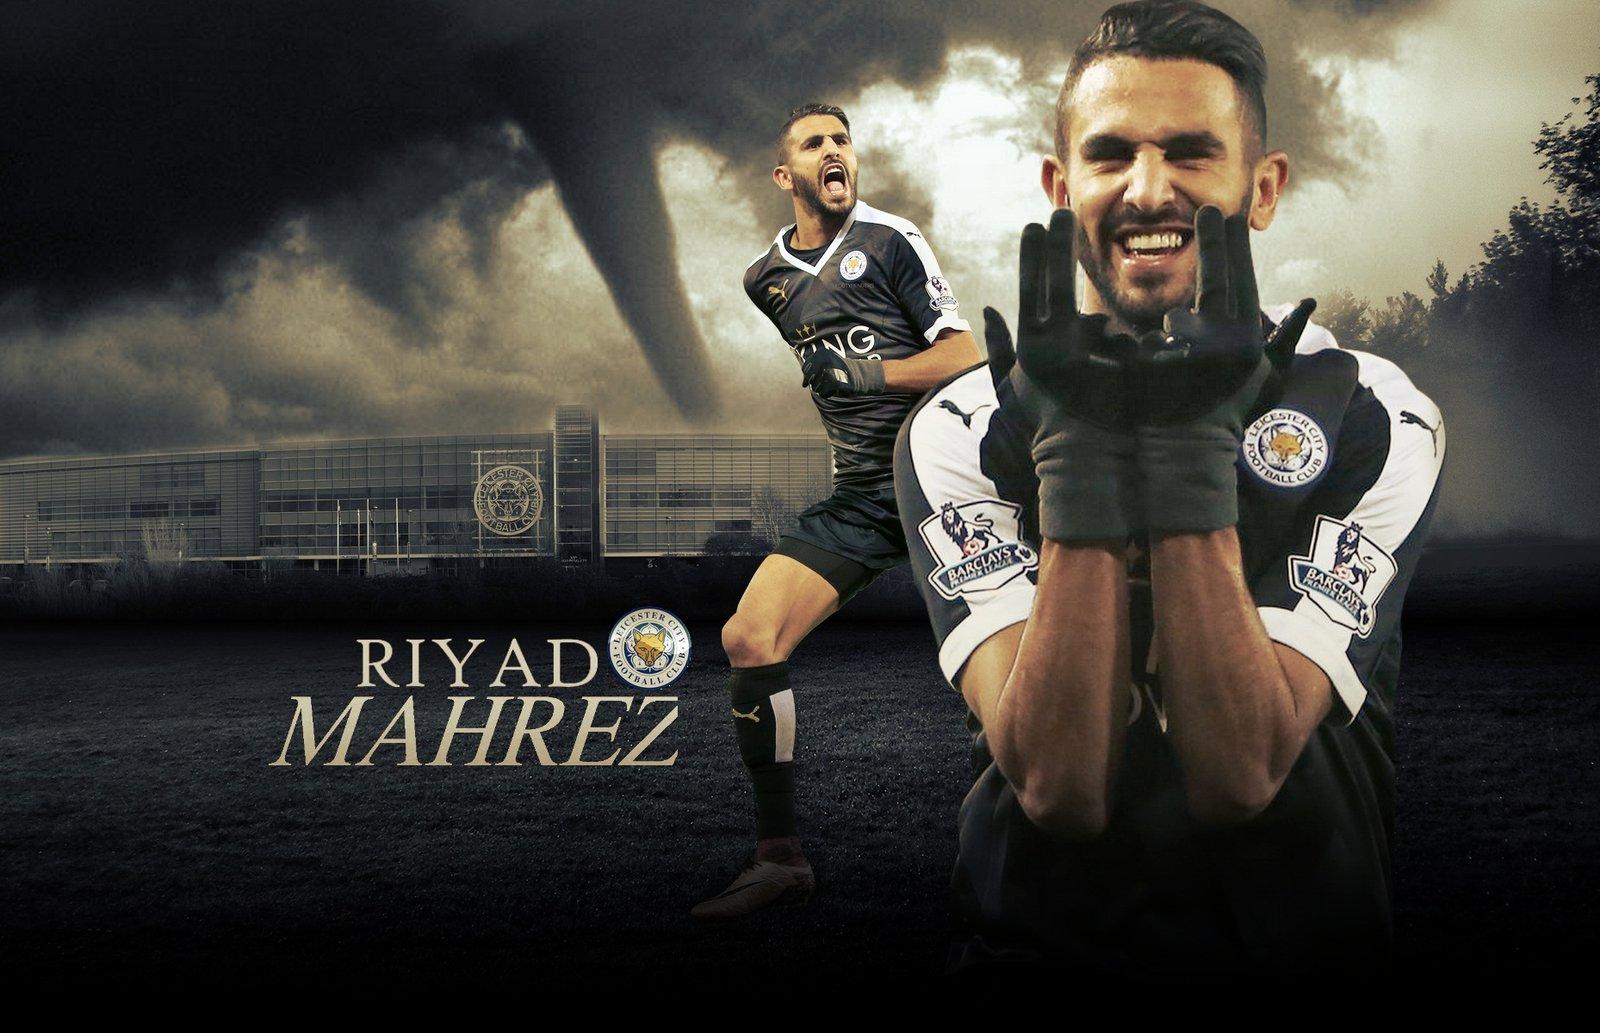 Riyad Mahrez Wallpaper Iphone